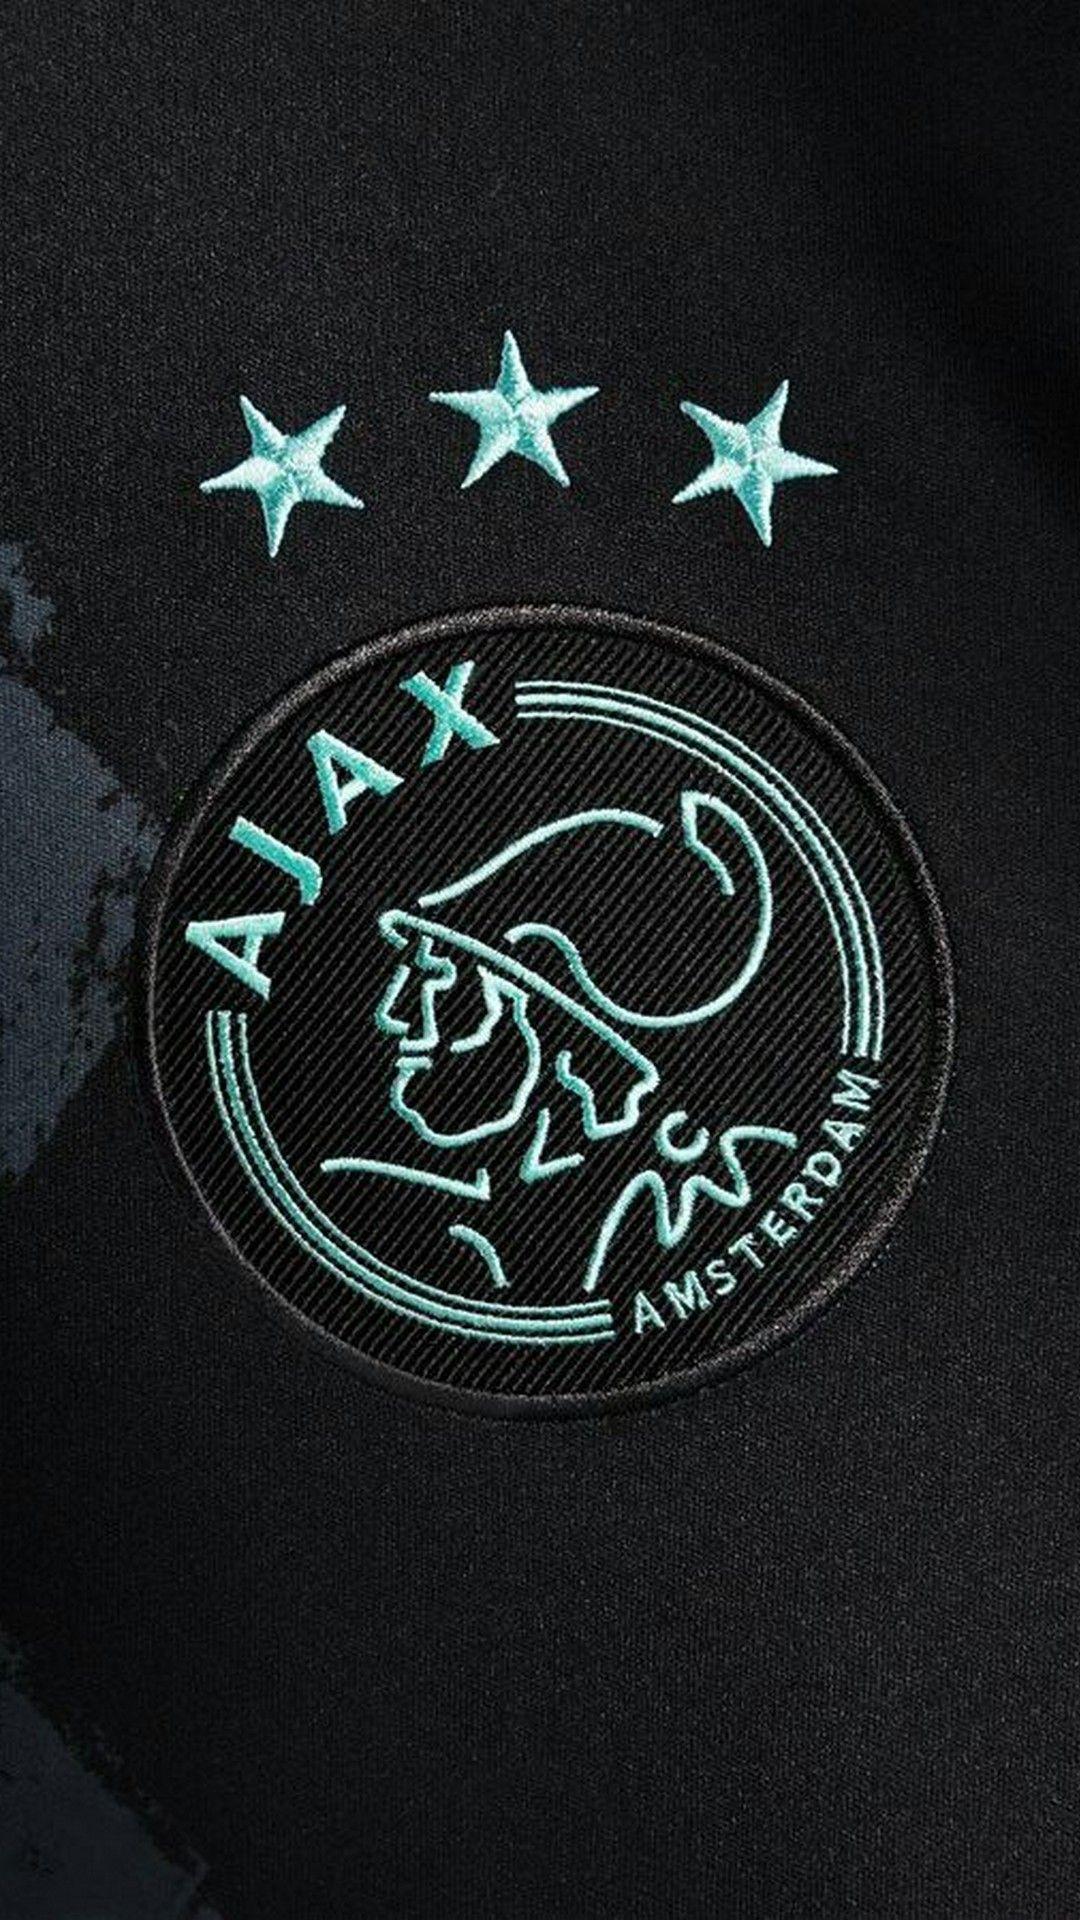 Ajax Wallpaper For Iphone Best Iphone Wallpaper Football Wallpaper Ajax Iphone Wallpaper